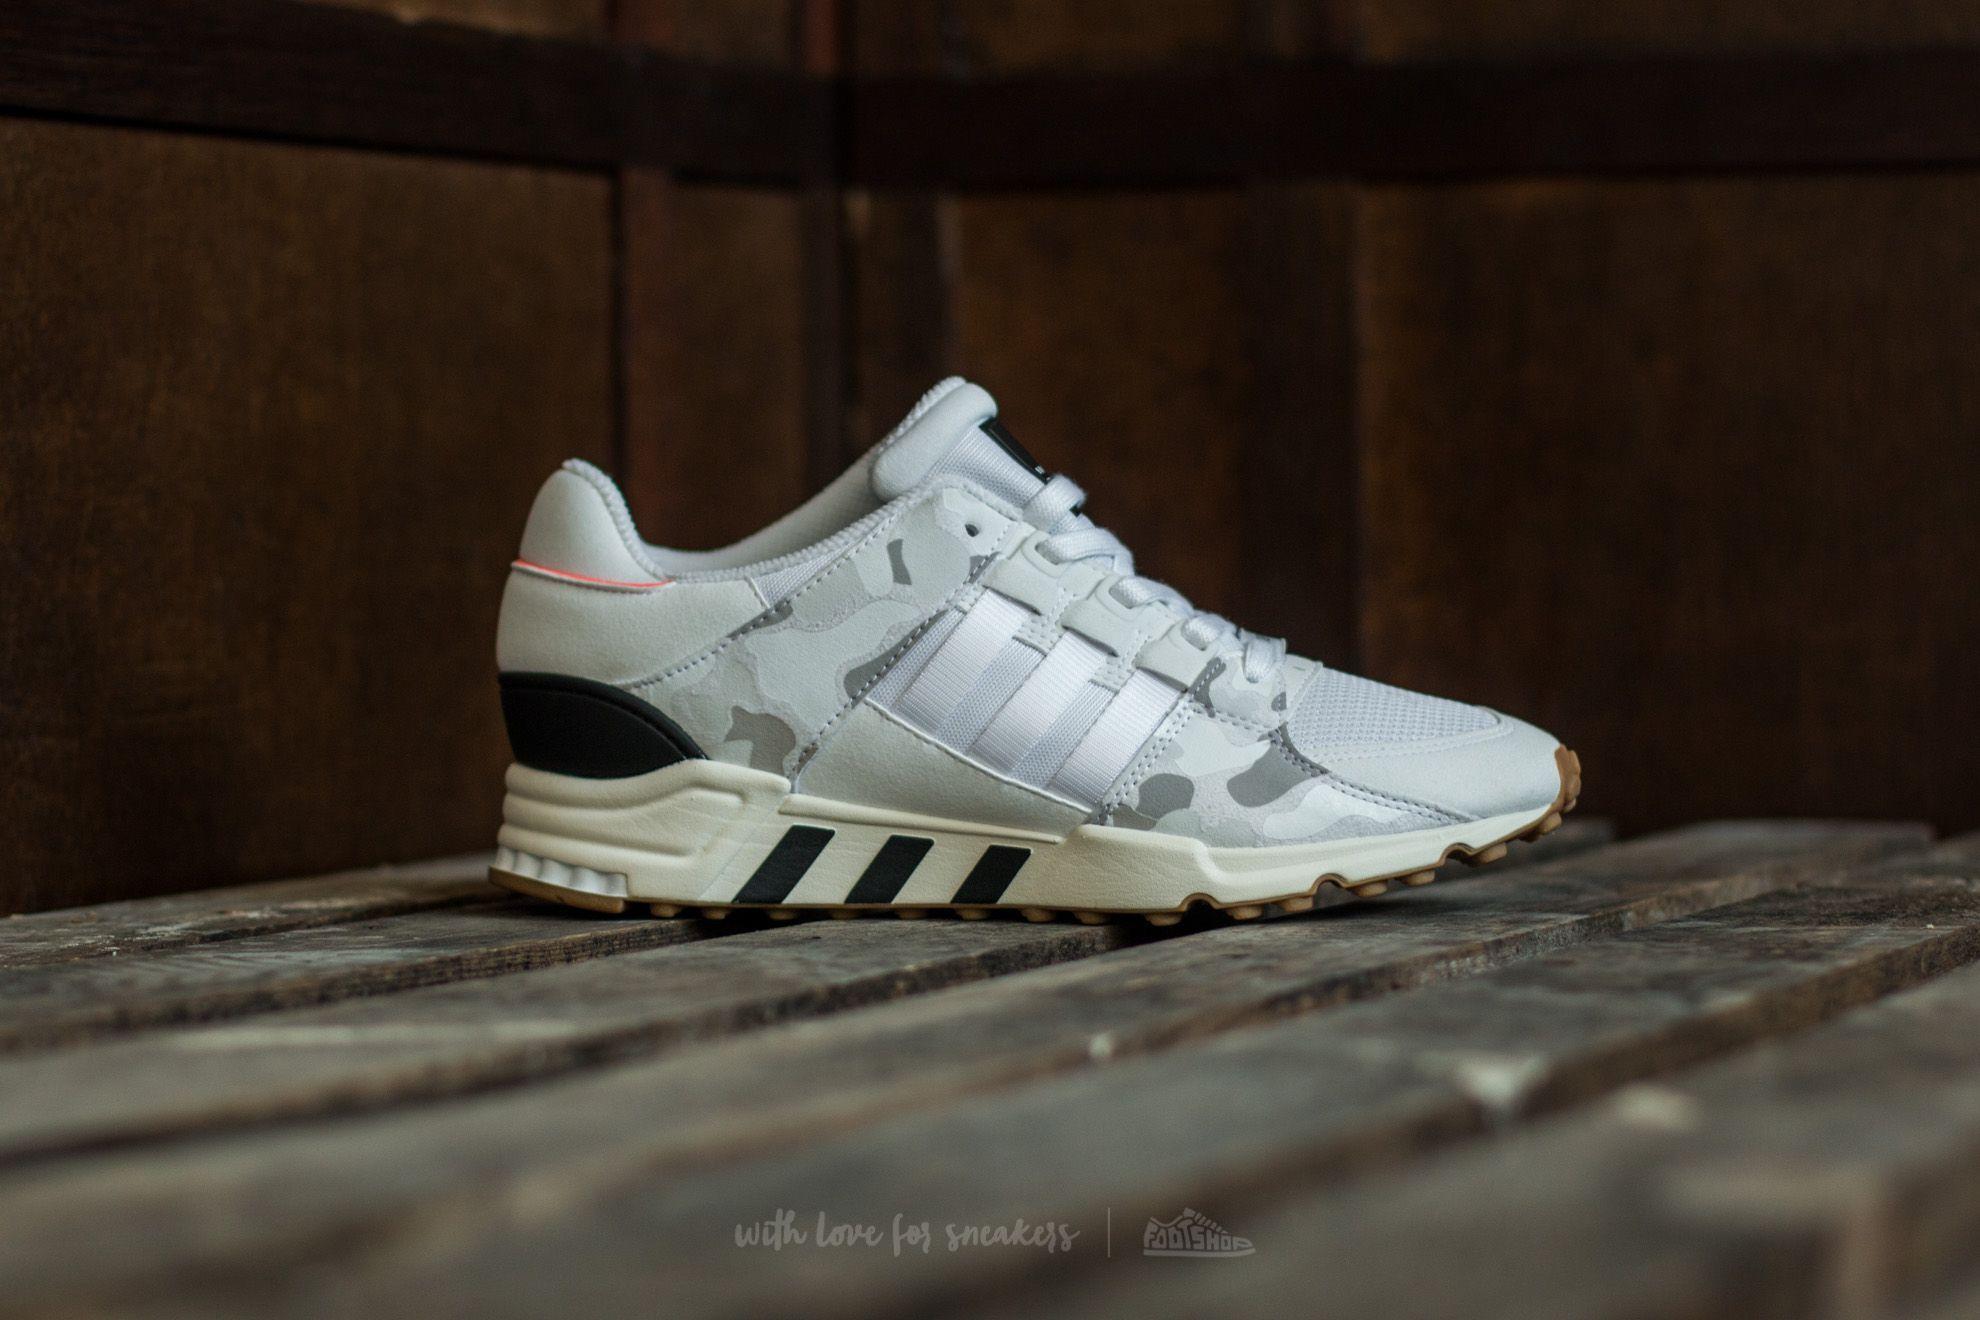 7d3df6739 adidas shoes men eqt support rf original adidas nmd xr1 white mens ...